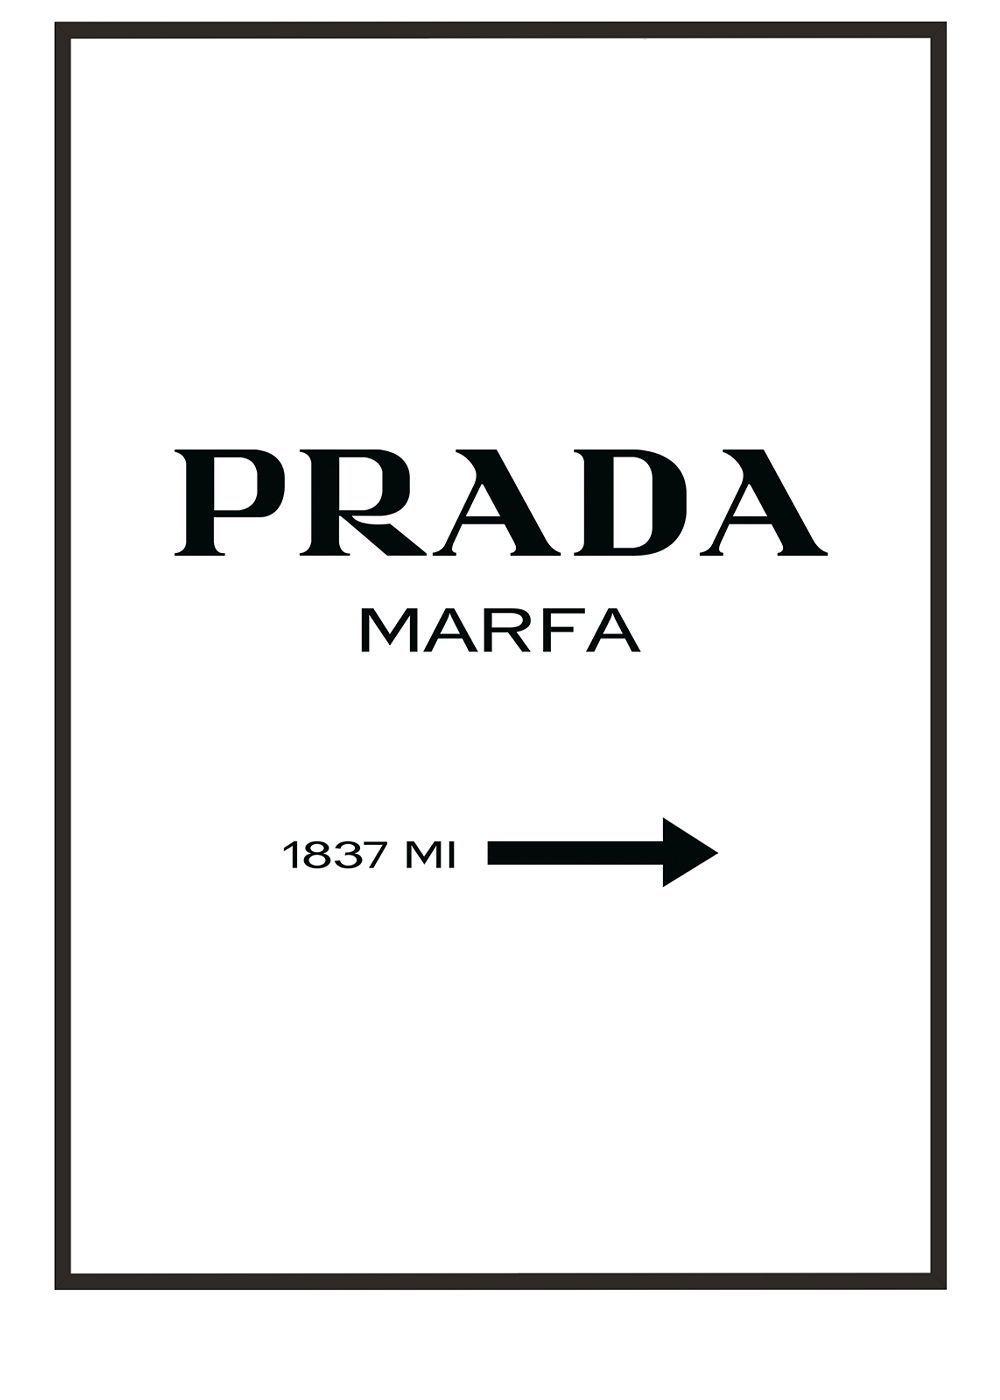 premium poster set prada marfa wallart